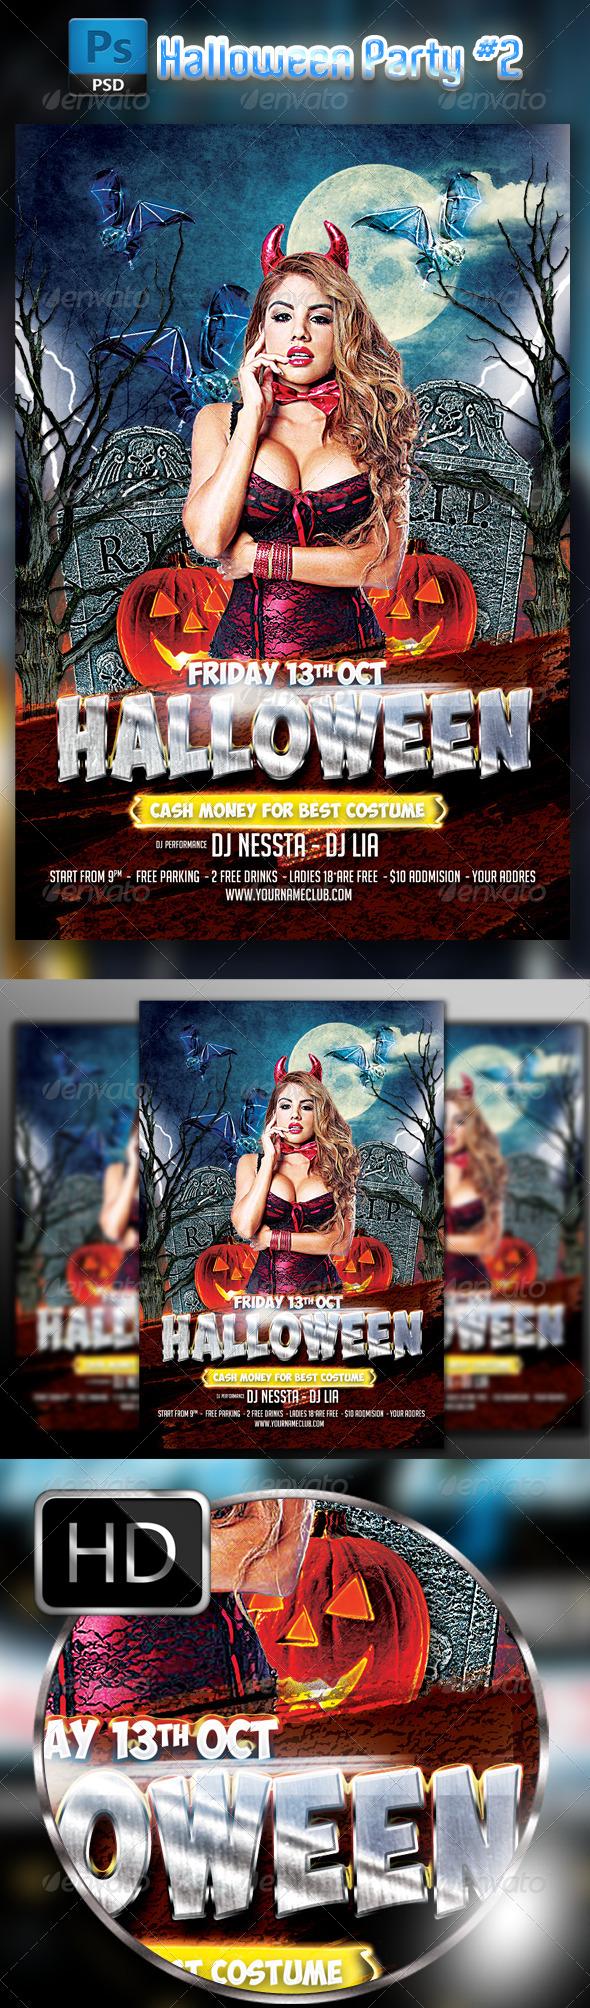 Halloween Party Flyer #2